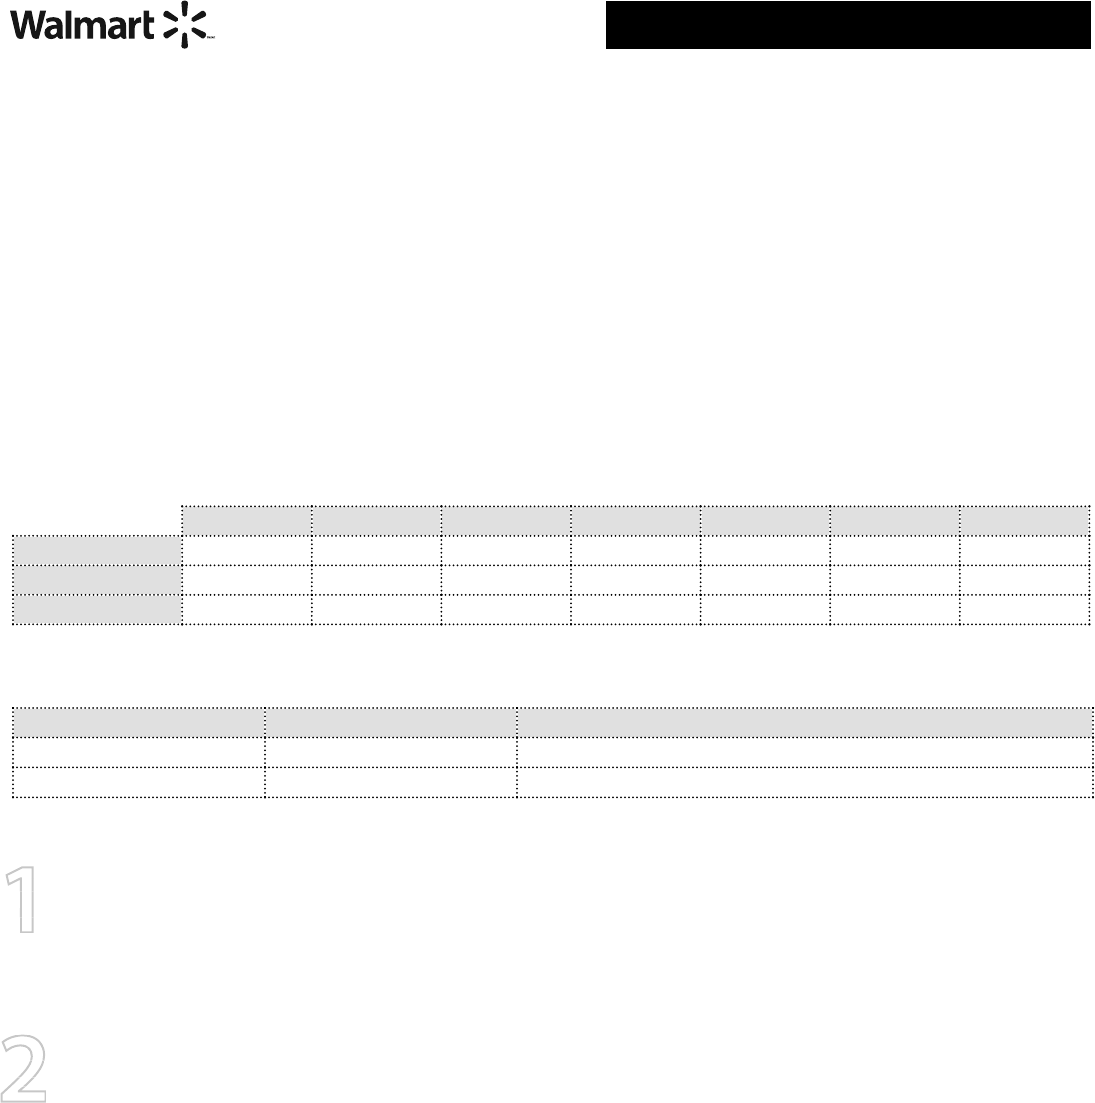 graphic regarding Walmart Printable Applications called Cost-free Printable Walmart Activity Software Kind